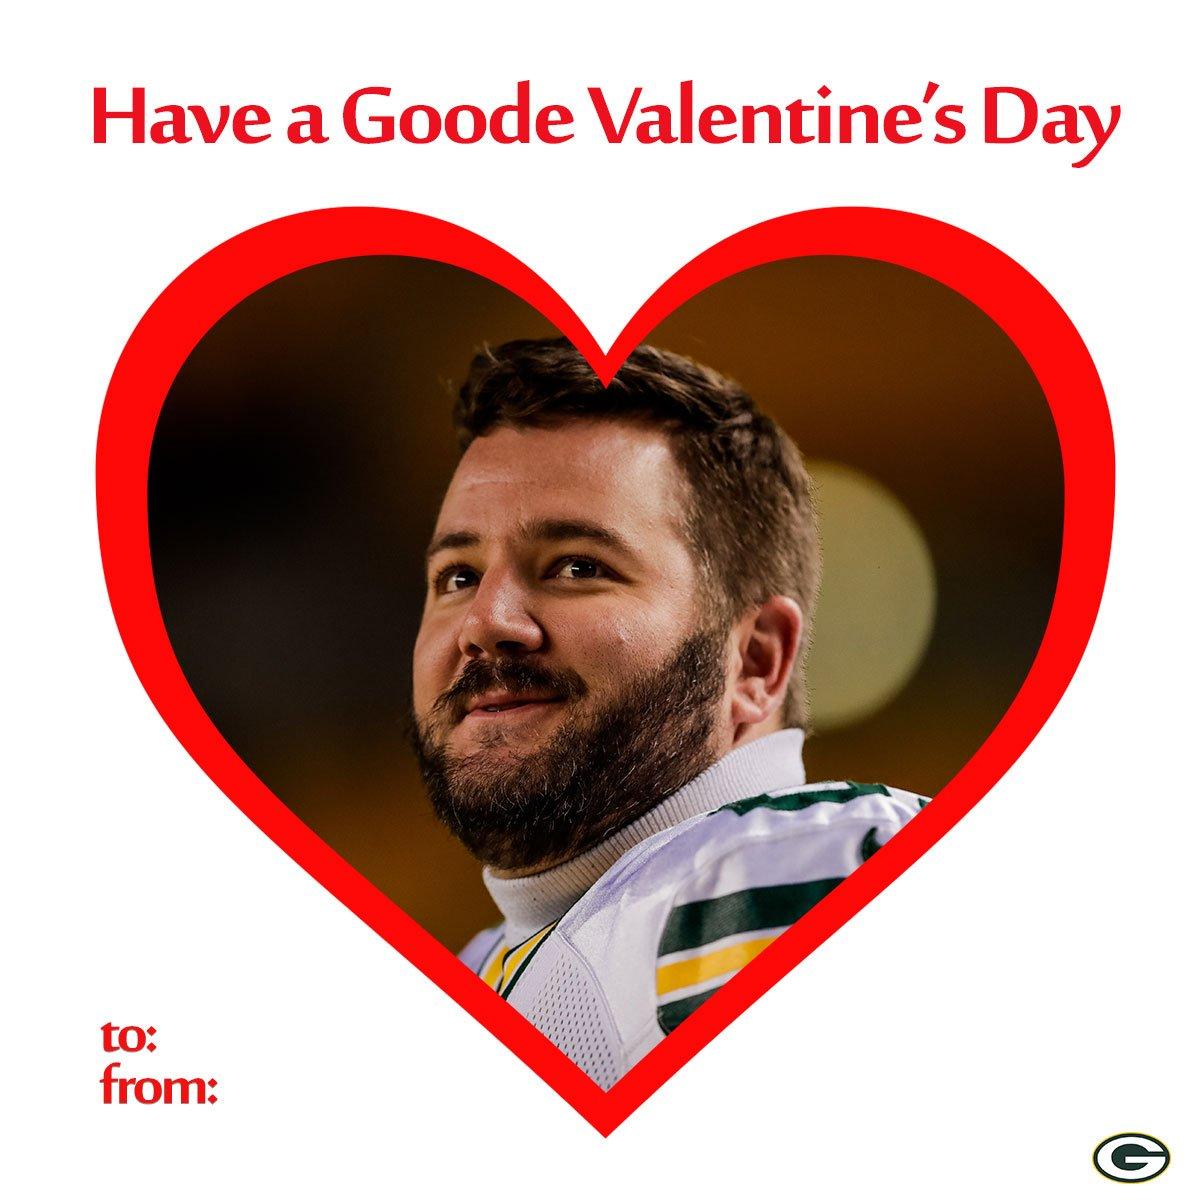 Have a Goode #ValentinesDay, everyone.   ����: https://t.co/4U5HZK45ta https://t.co/5sMjYXmPMu